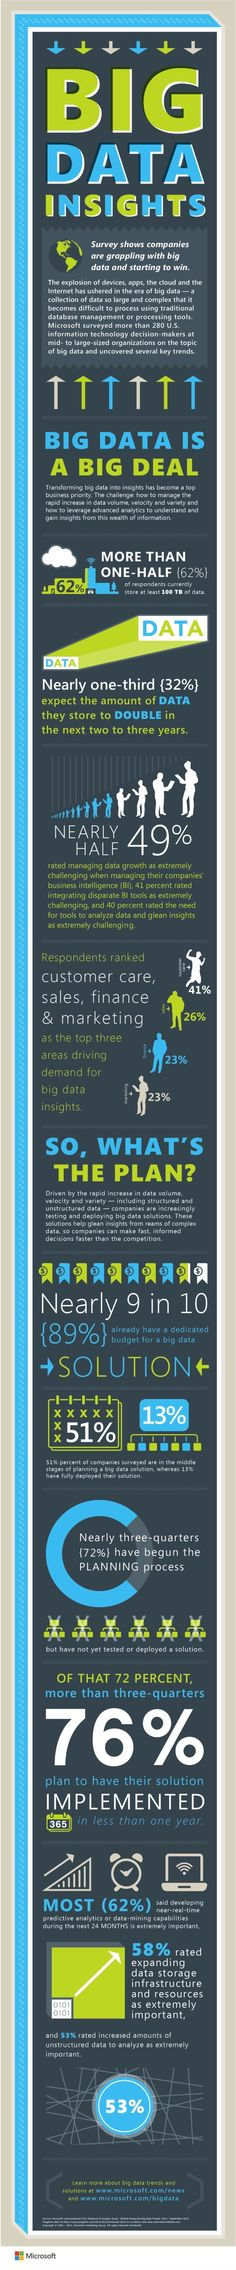 Infographic: Big Data Insights – Companies Are Attacking Big Data In A Big Way Marketing Digital, Marketing Data, Mobile Marketing, Marketing Strategies, Inbound Marketing, Business Marketing, Content Marketing, Internet Marketing, Big Data